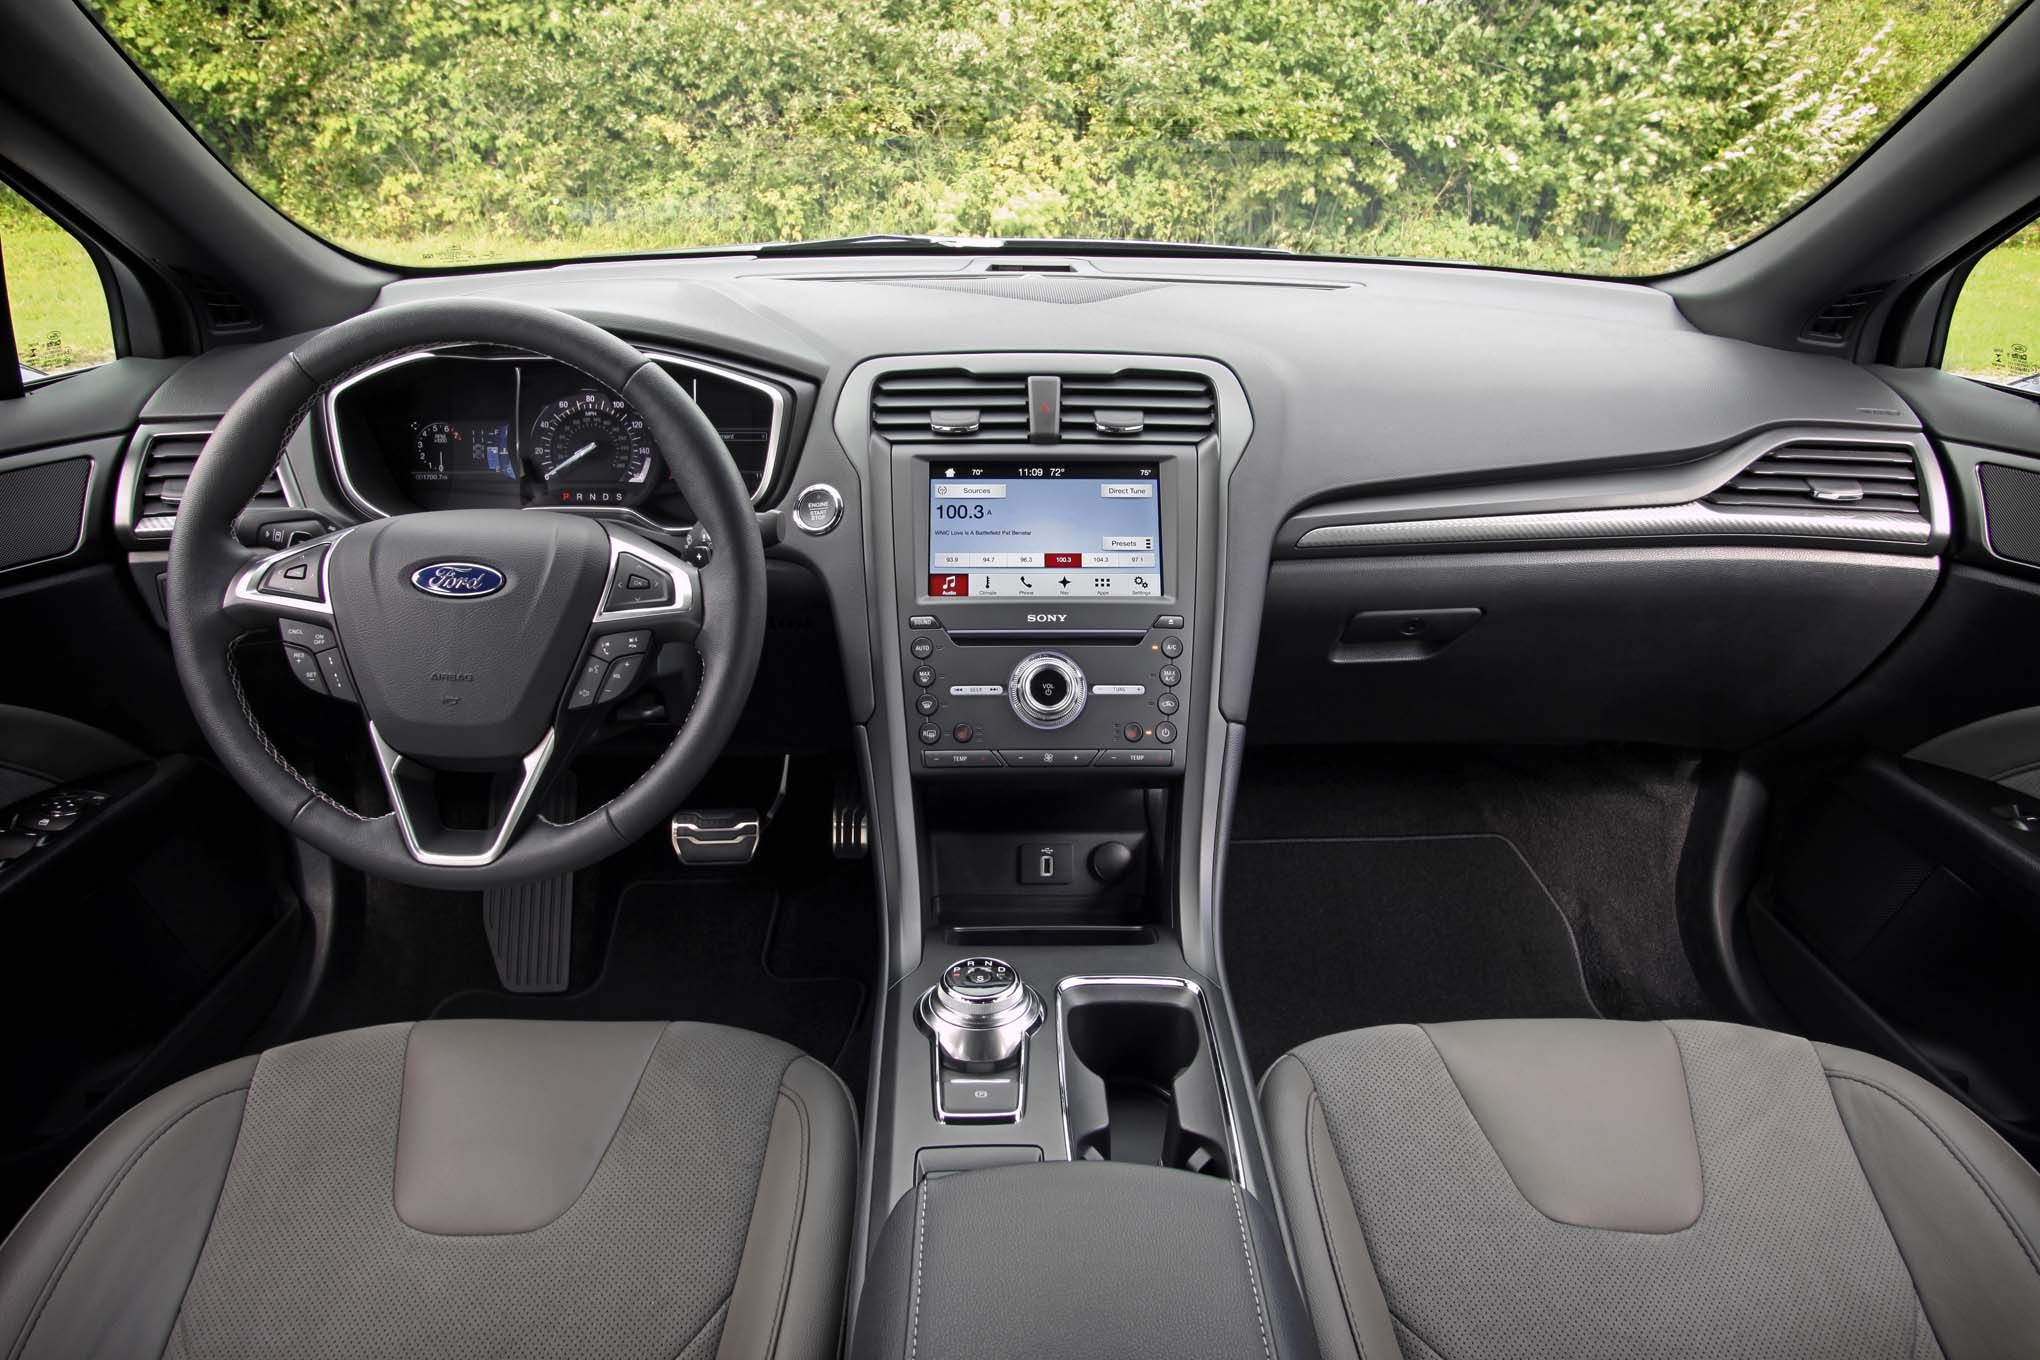 Ford Fusion V-6 Sport 2017: Primer Manejo - Motor Trend en Español